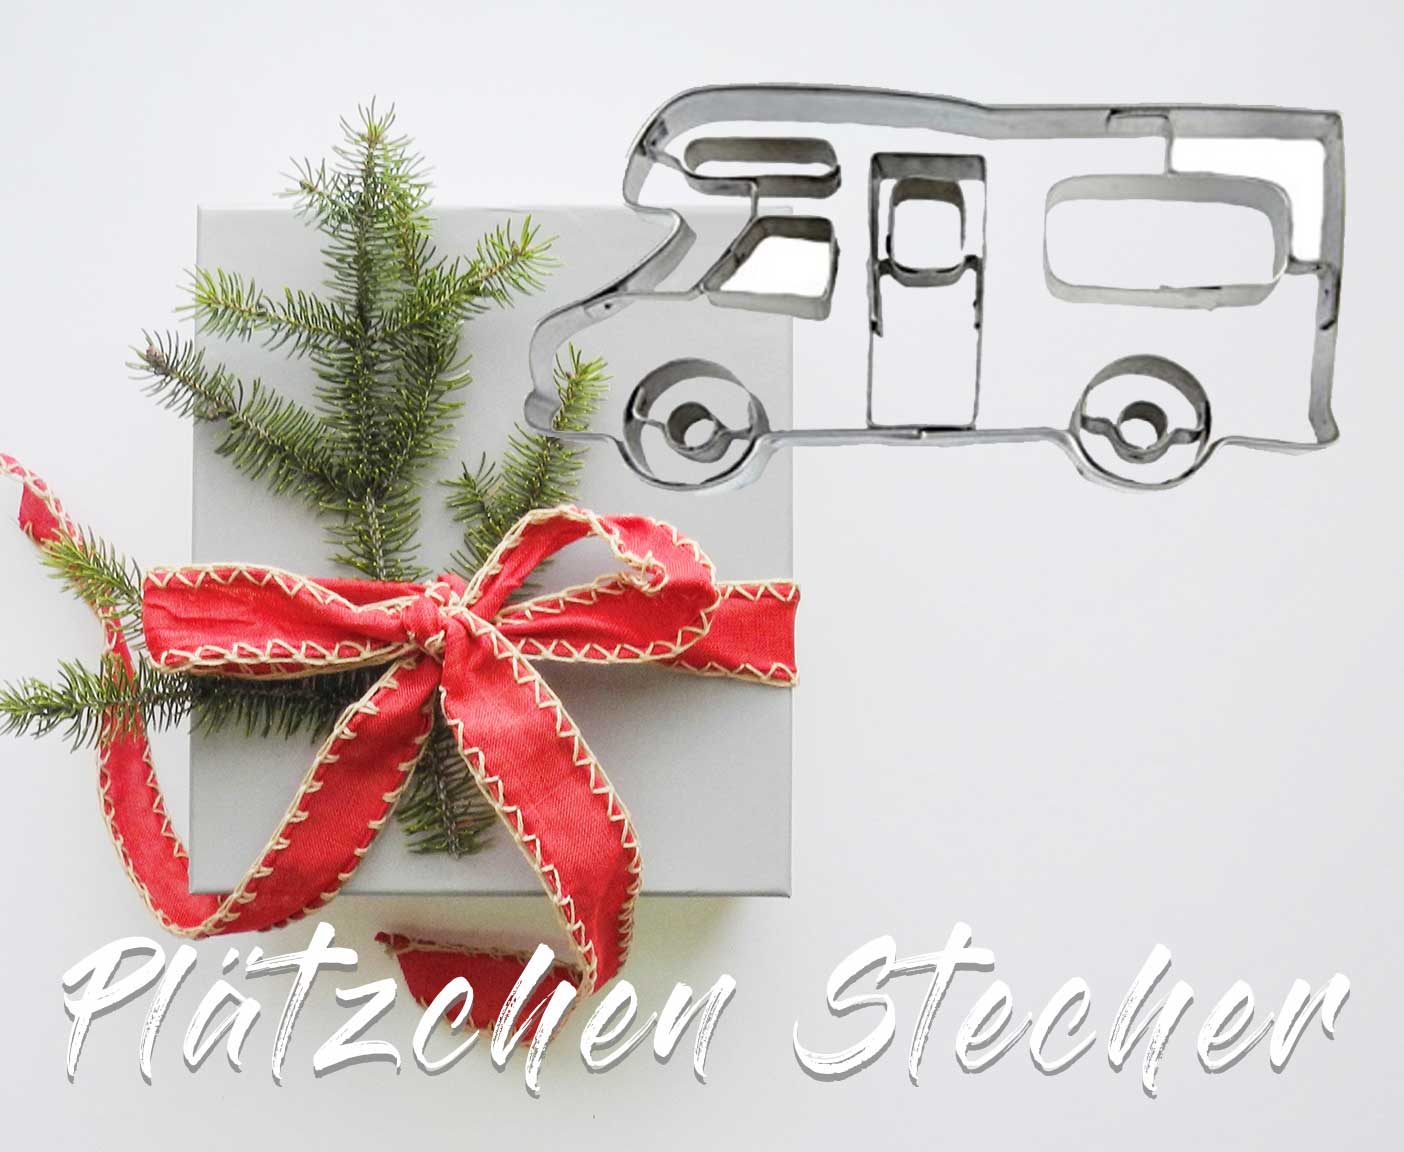 camper-geschenk-weihnachten-geschenkideen-wohnmobil-lustige-accessoires-geschenkkorb-camping-ideen-campen-geburtstag-camp-geschichten-vanlife-PlätzchenStecher_18